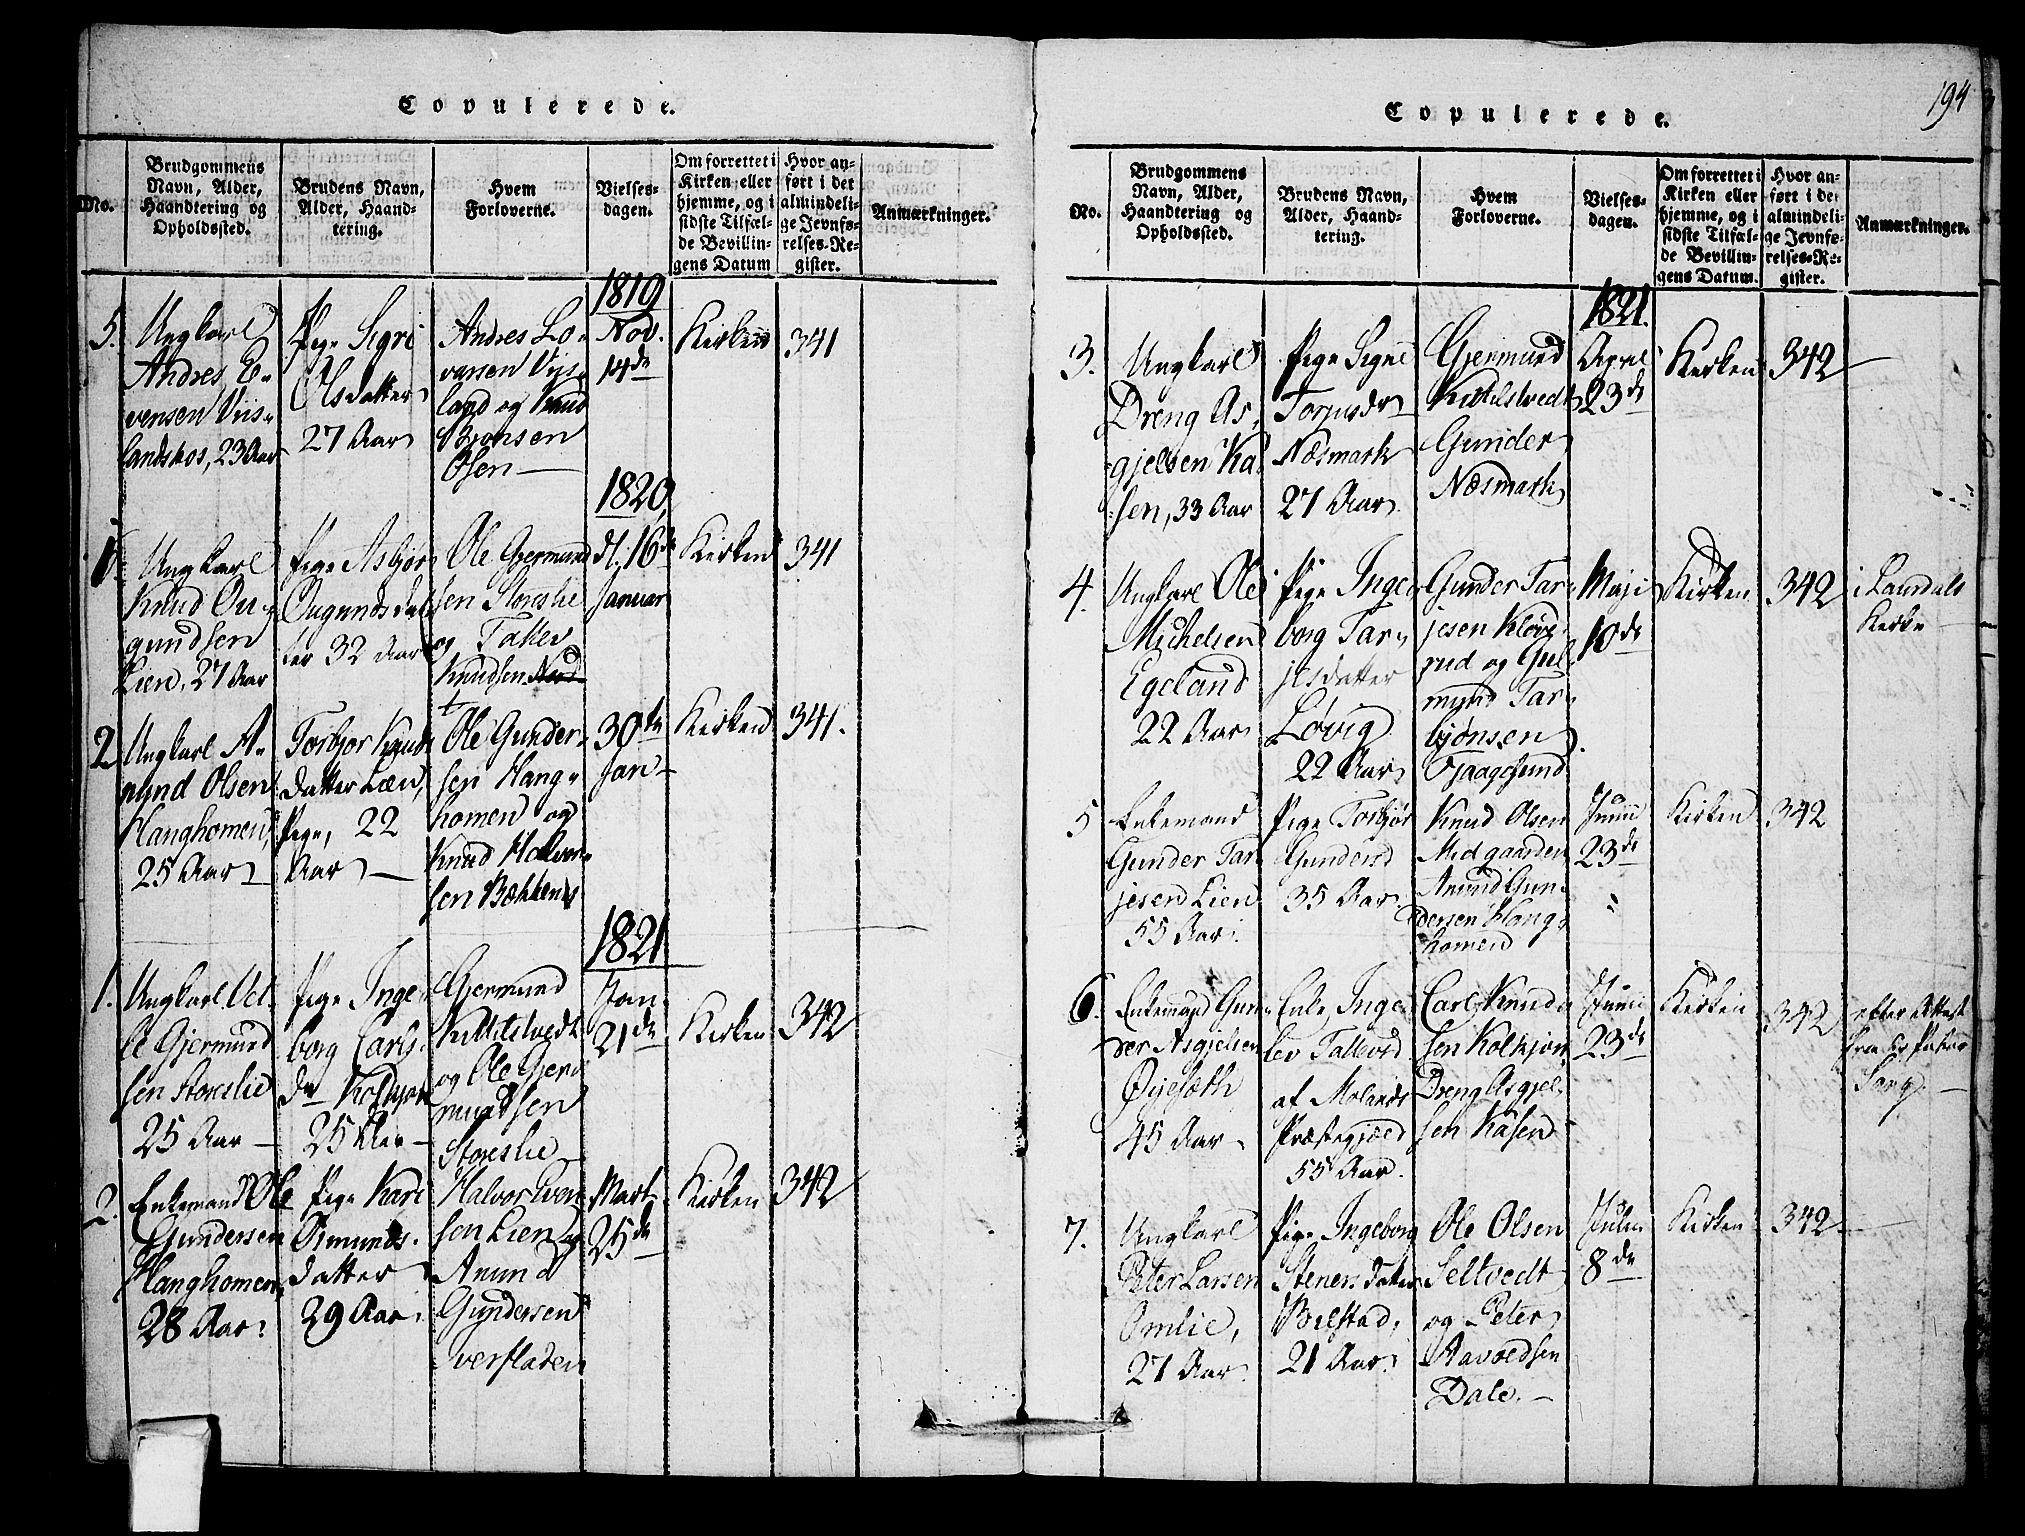 SAKO, Mo kirkebøker, F/Fb/L0001: Ministerialbok nr. II 1, 1814-1844, s. 194